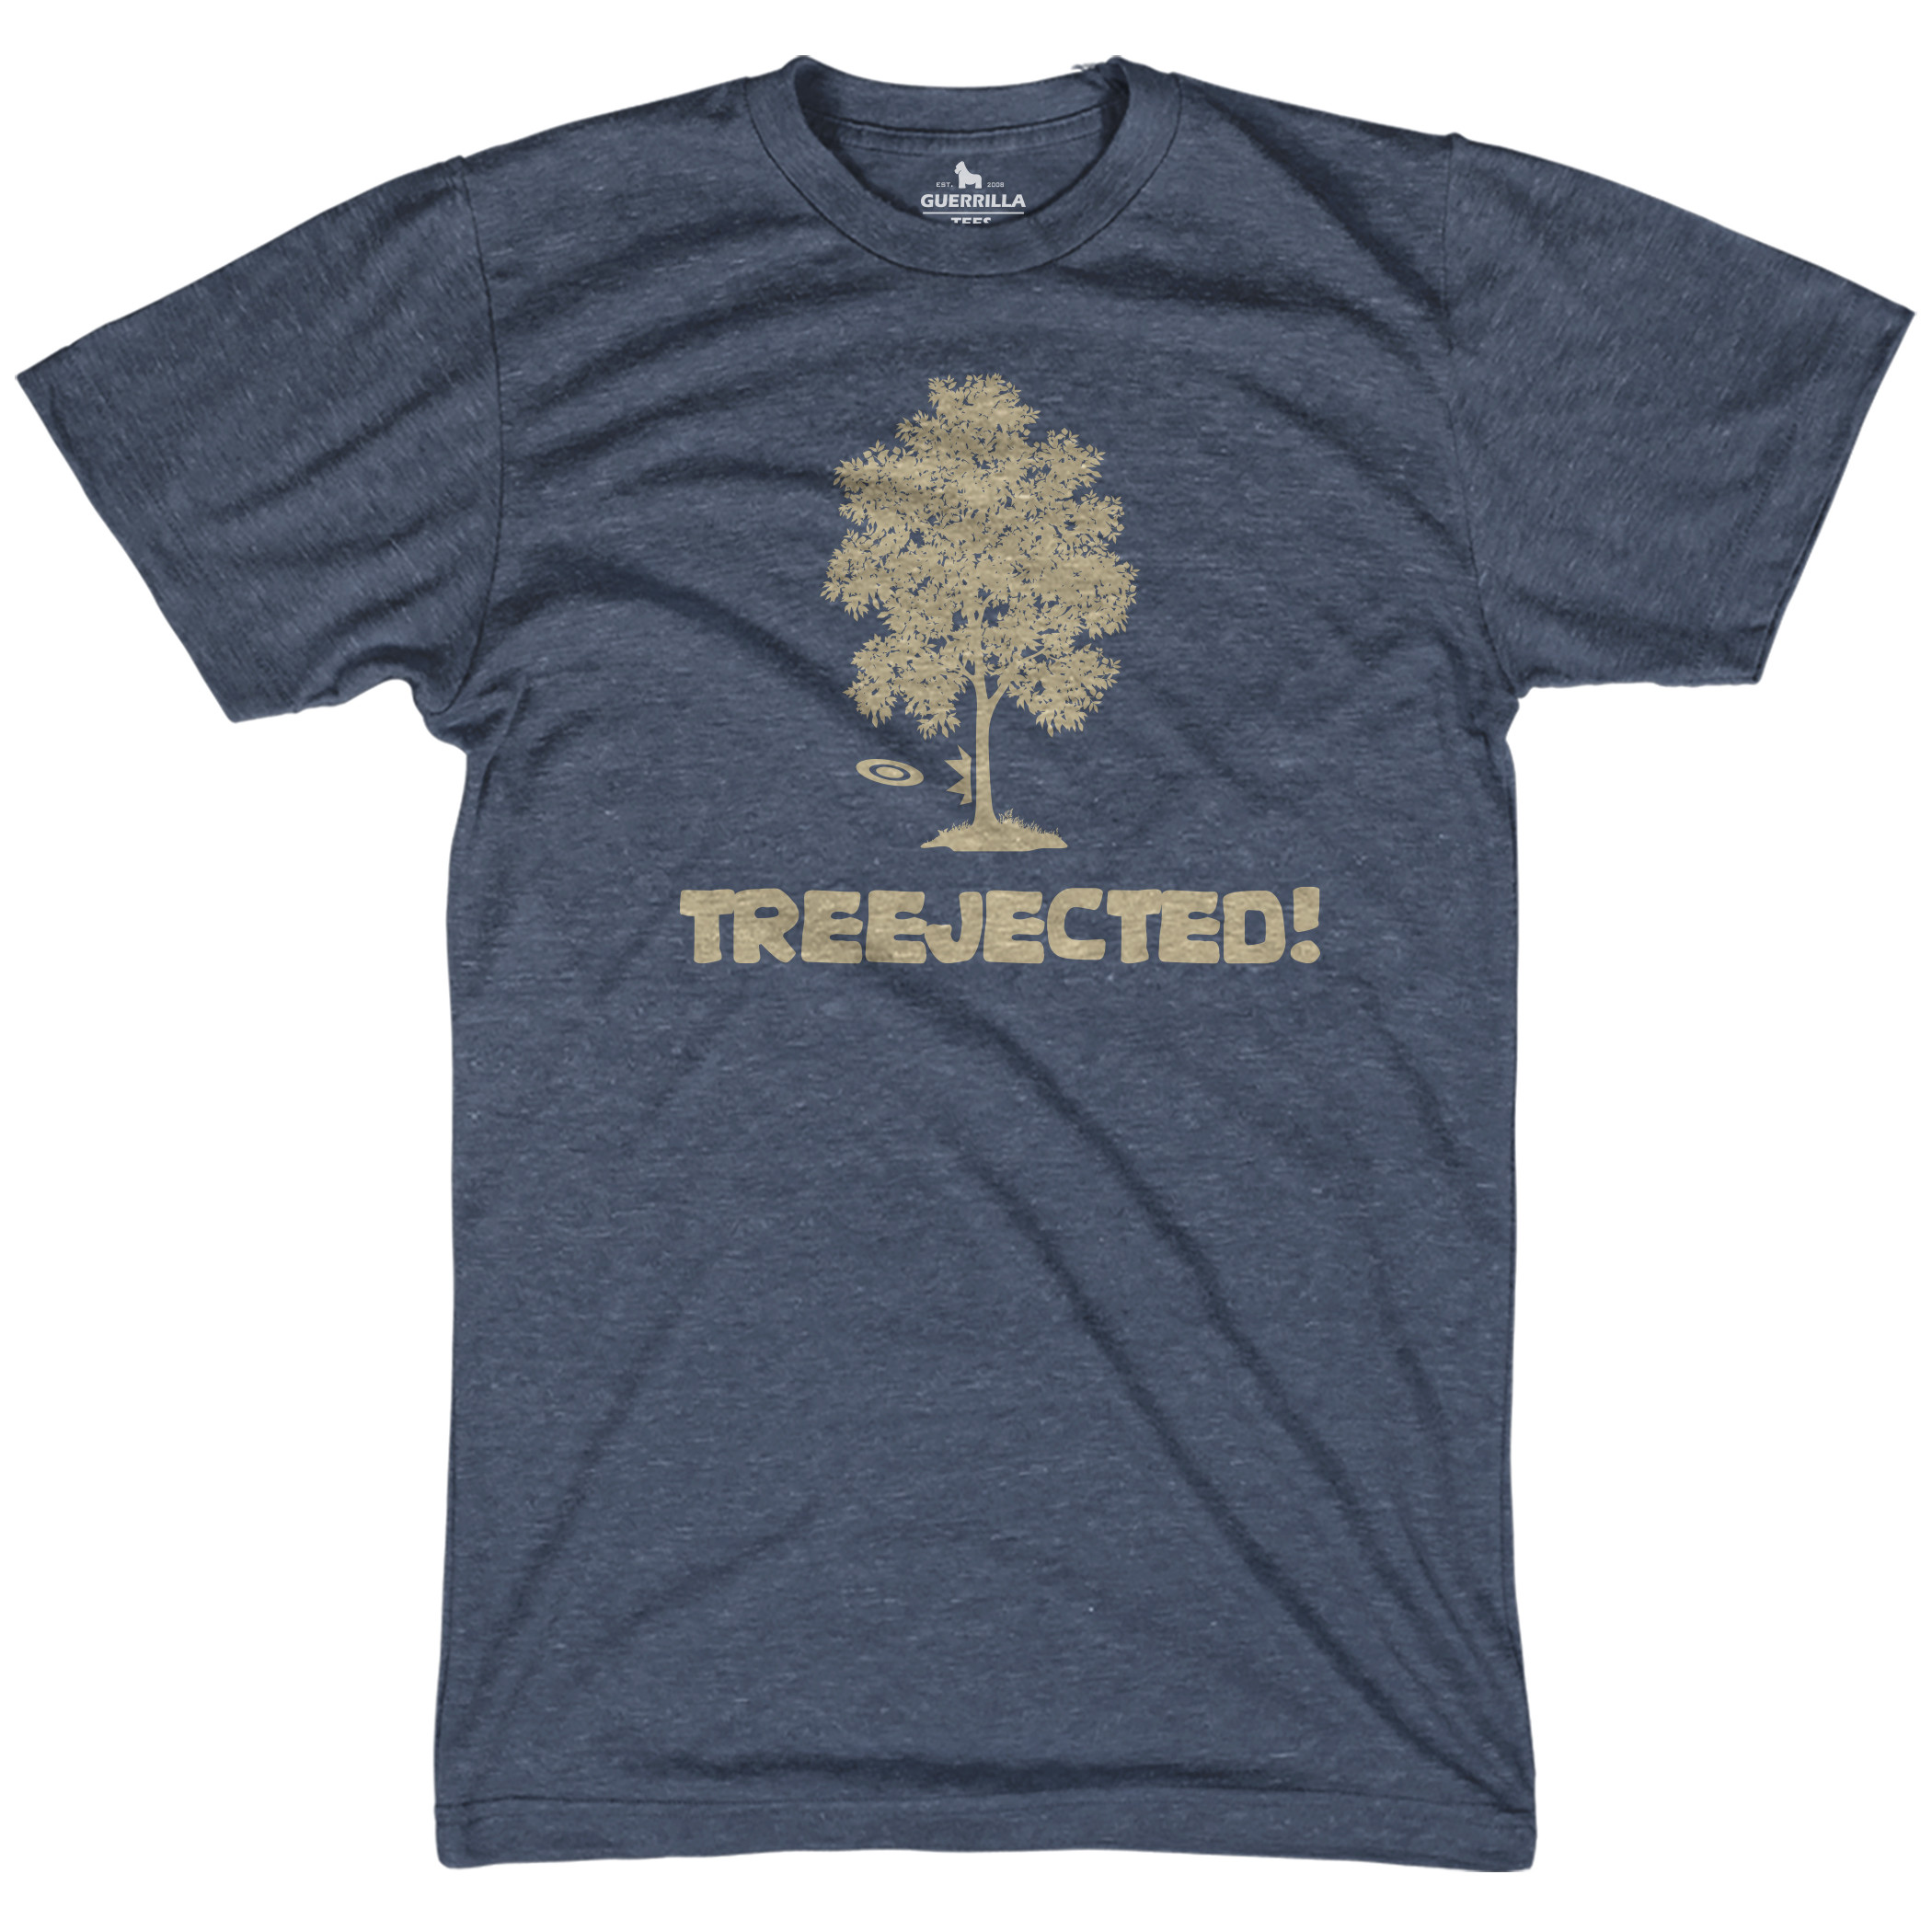 Treejected!